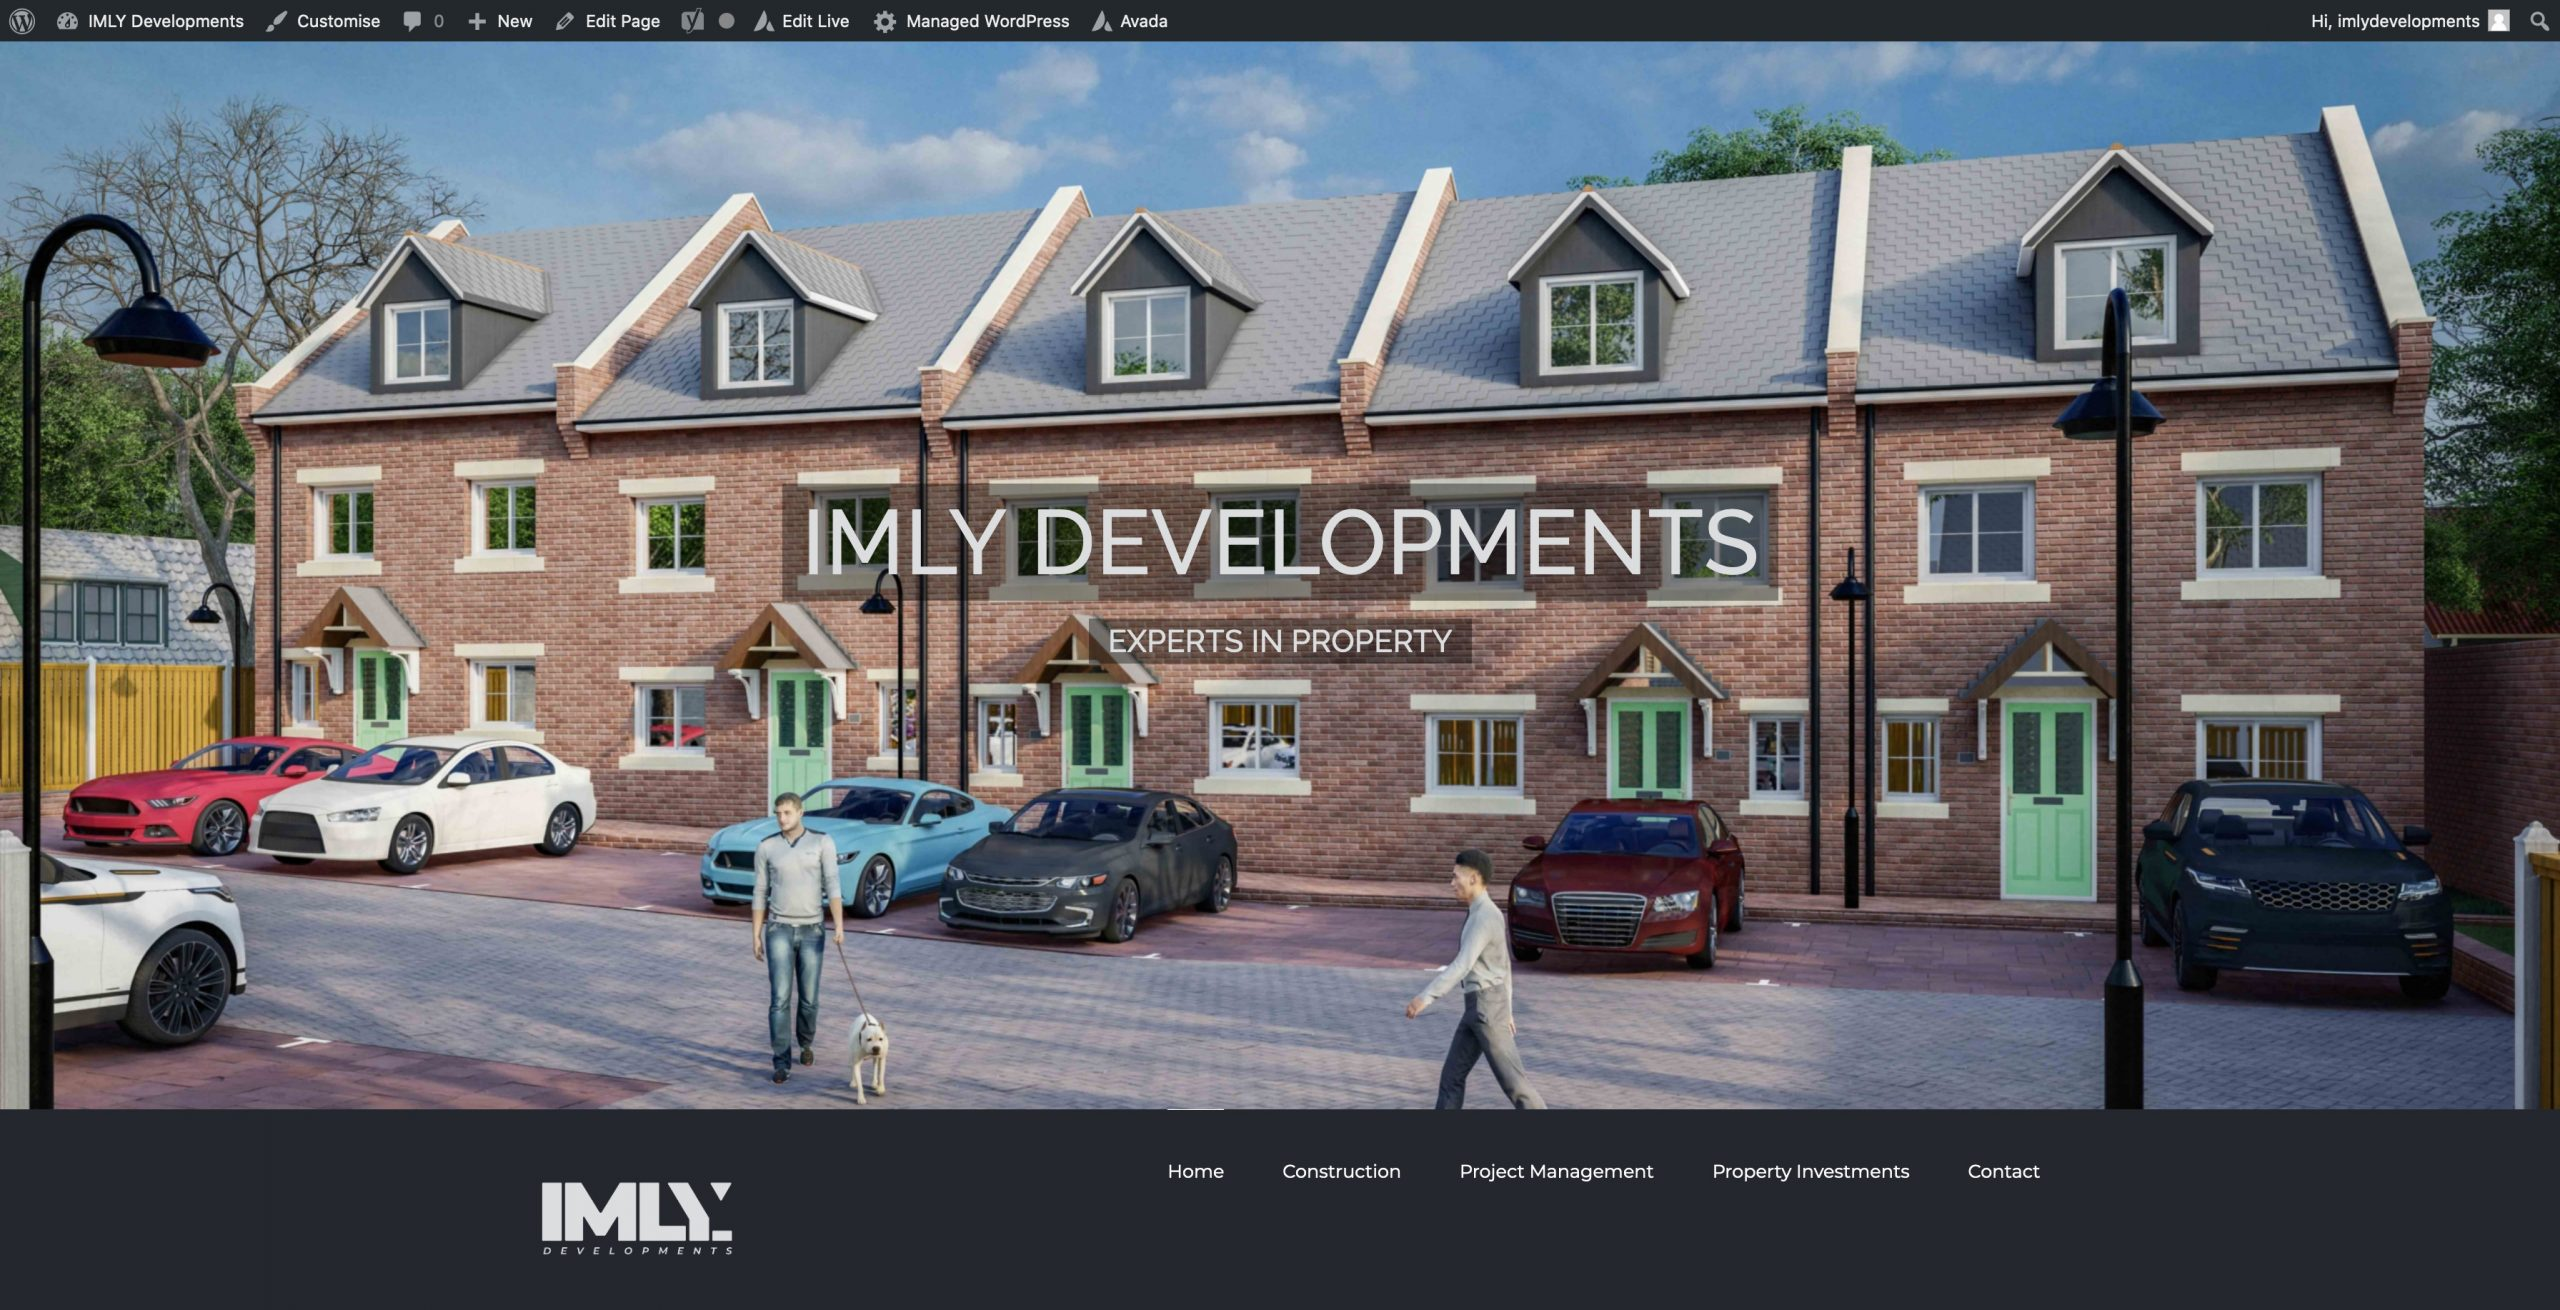 IMLY Developments Full Screen